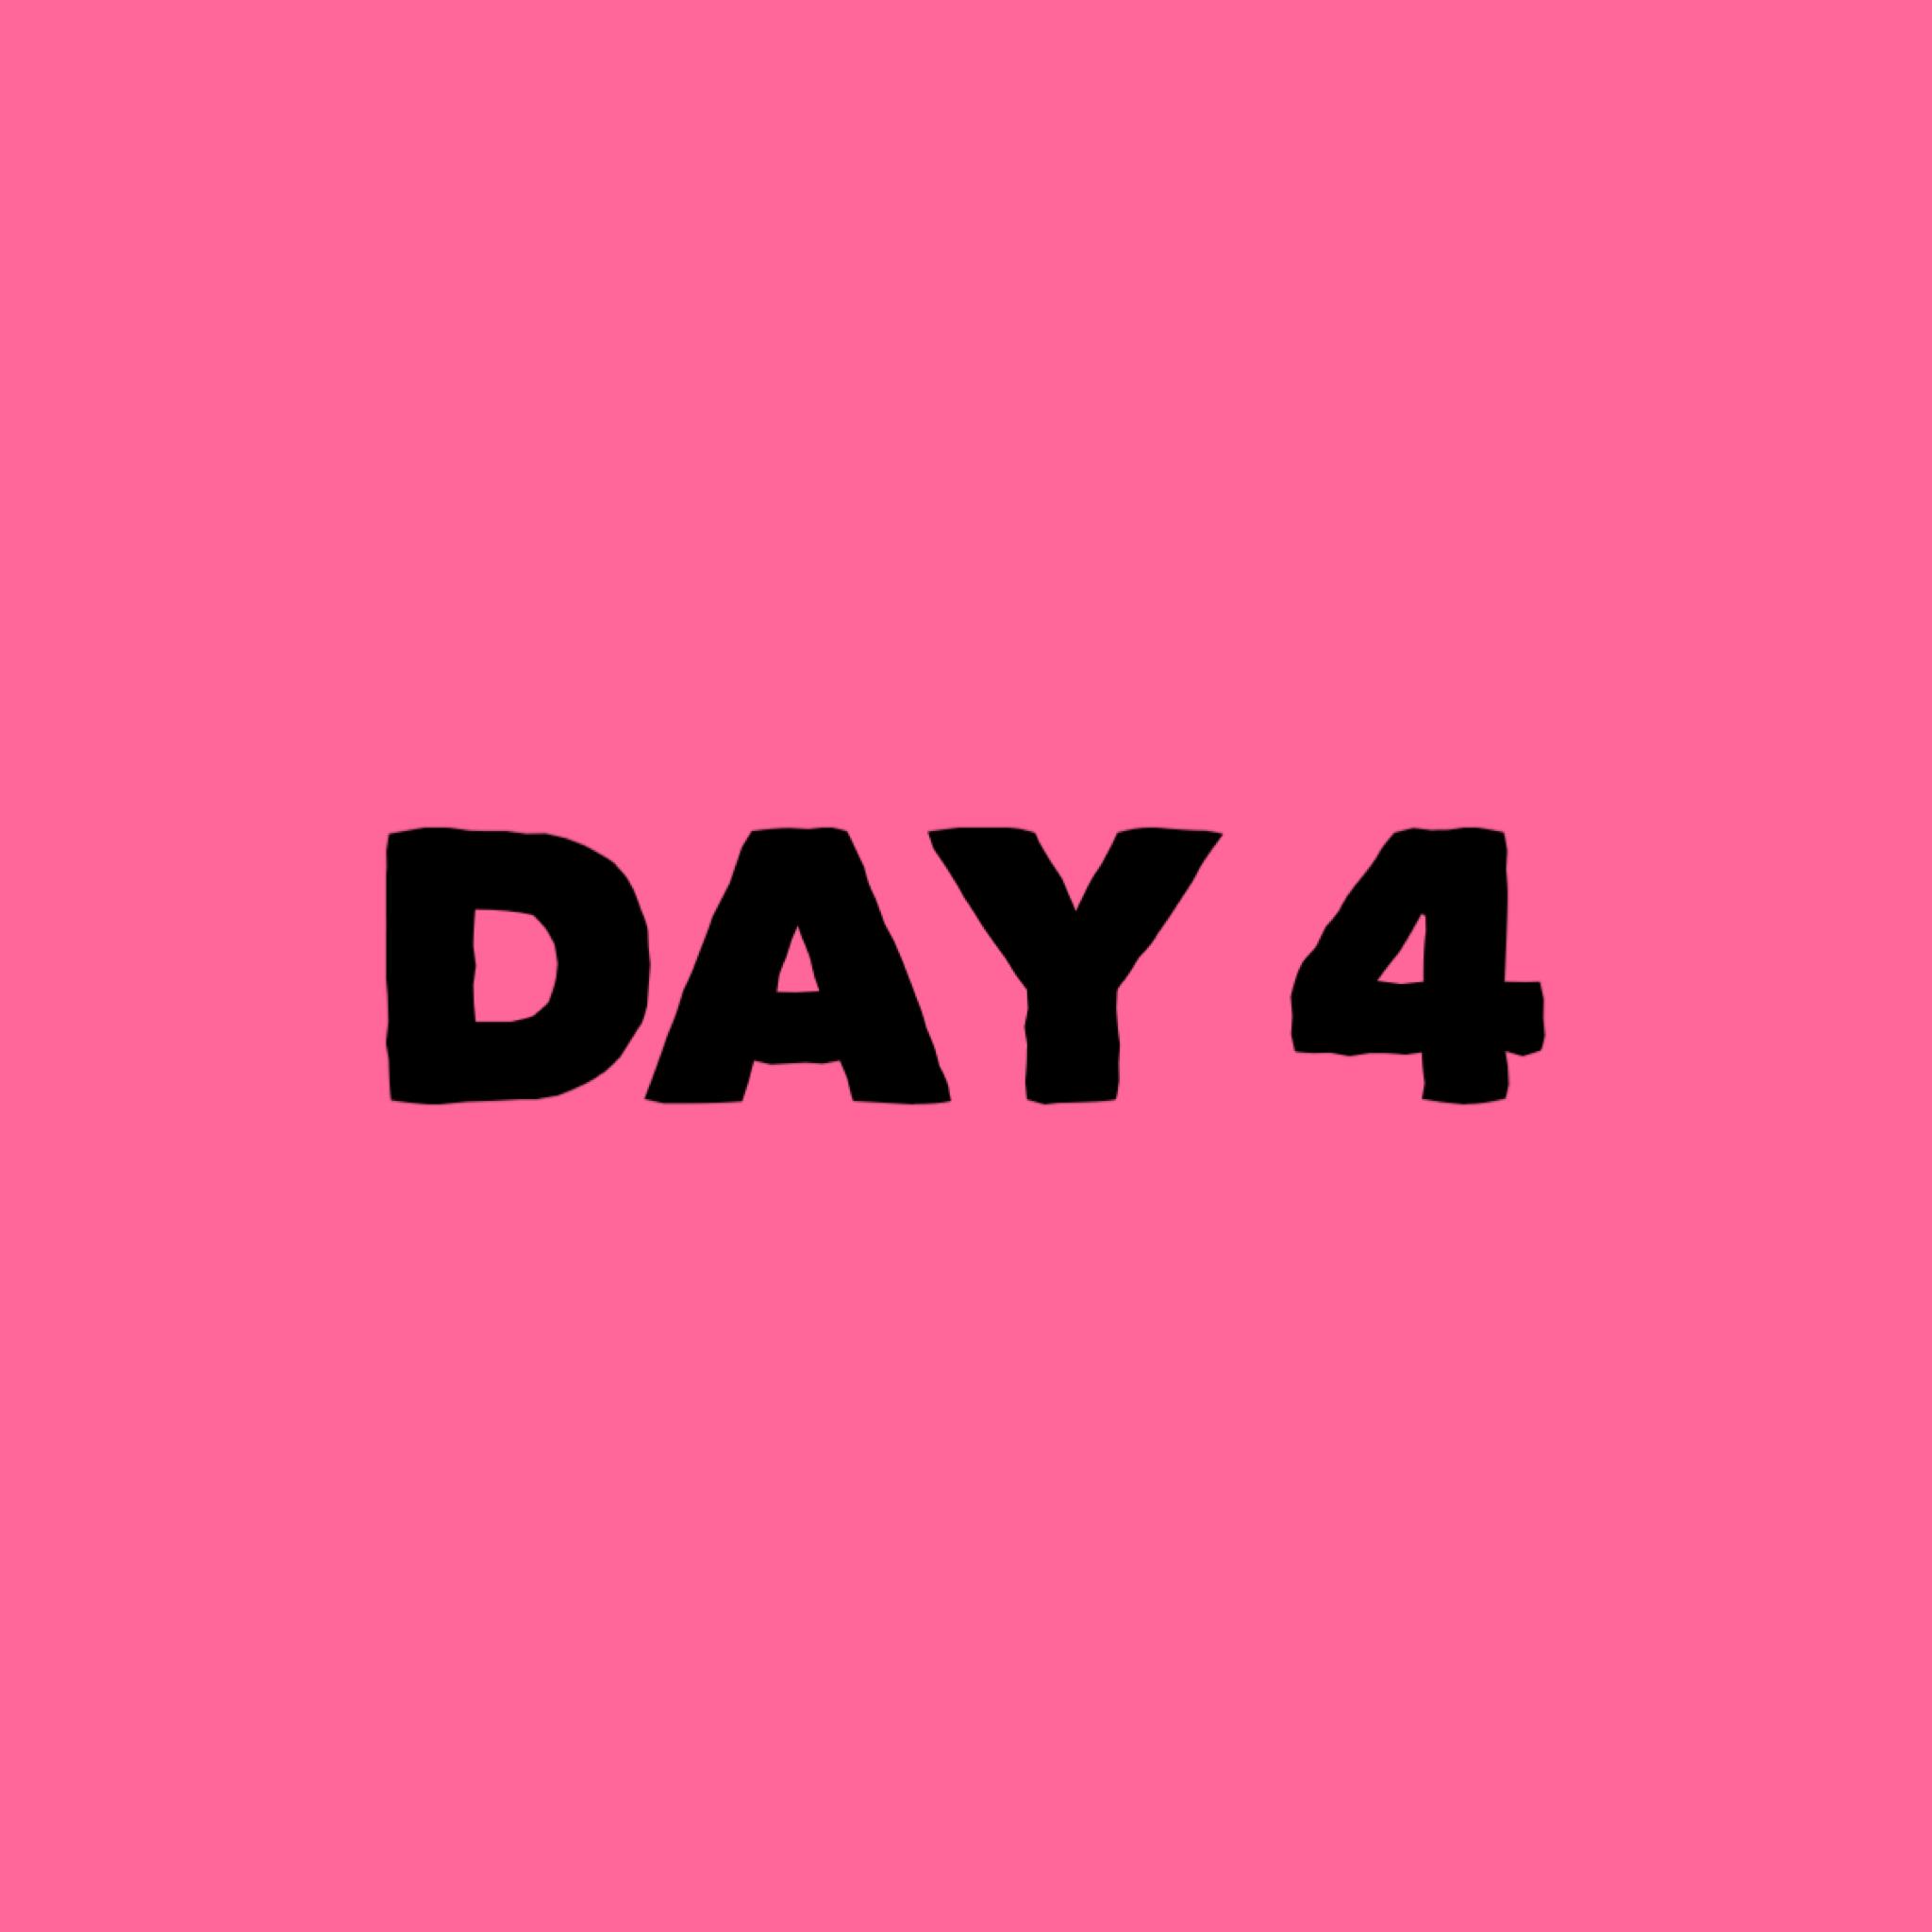 Day 4 of Abundance